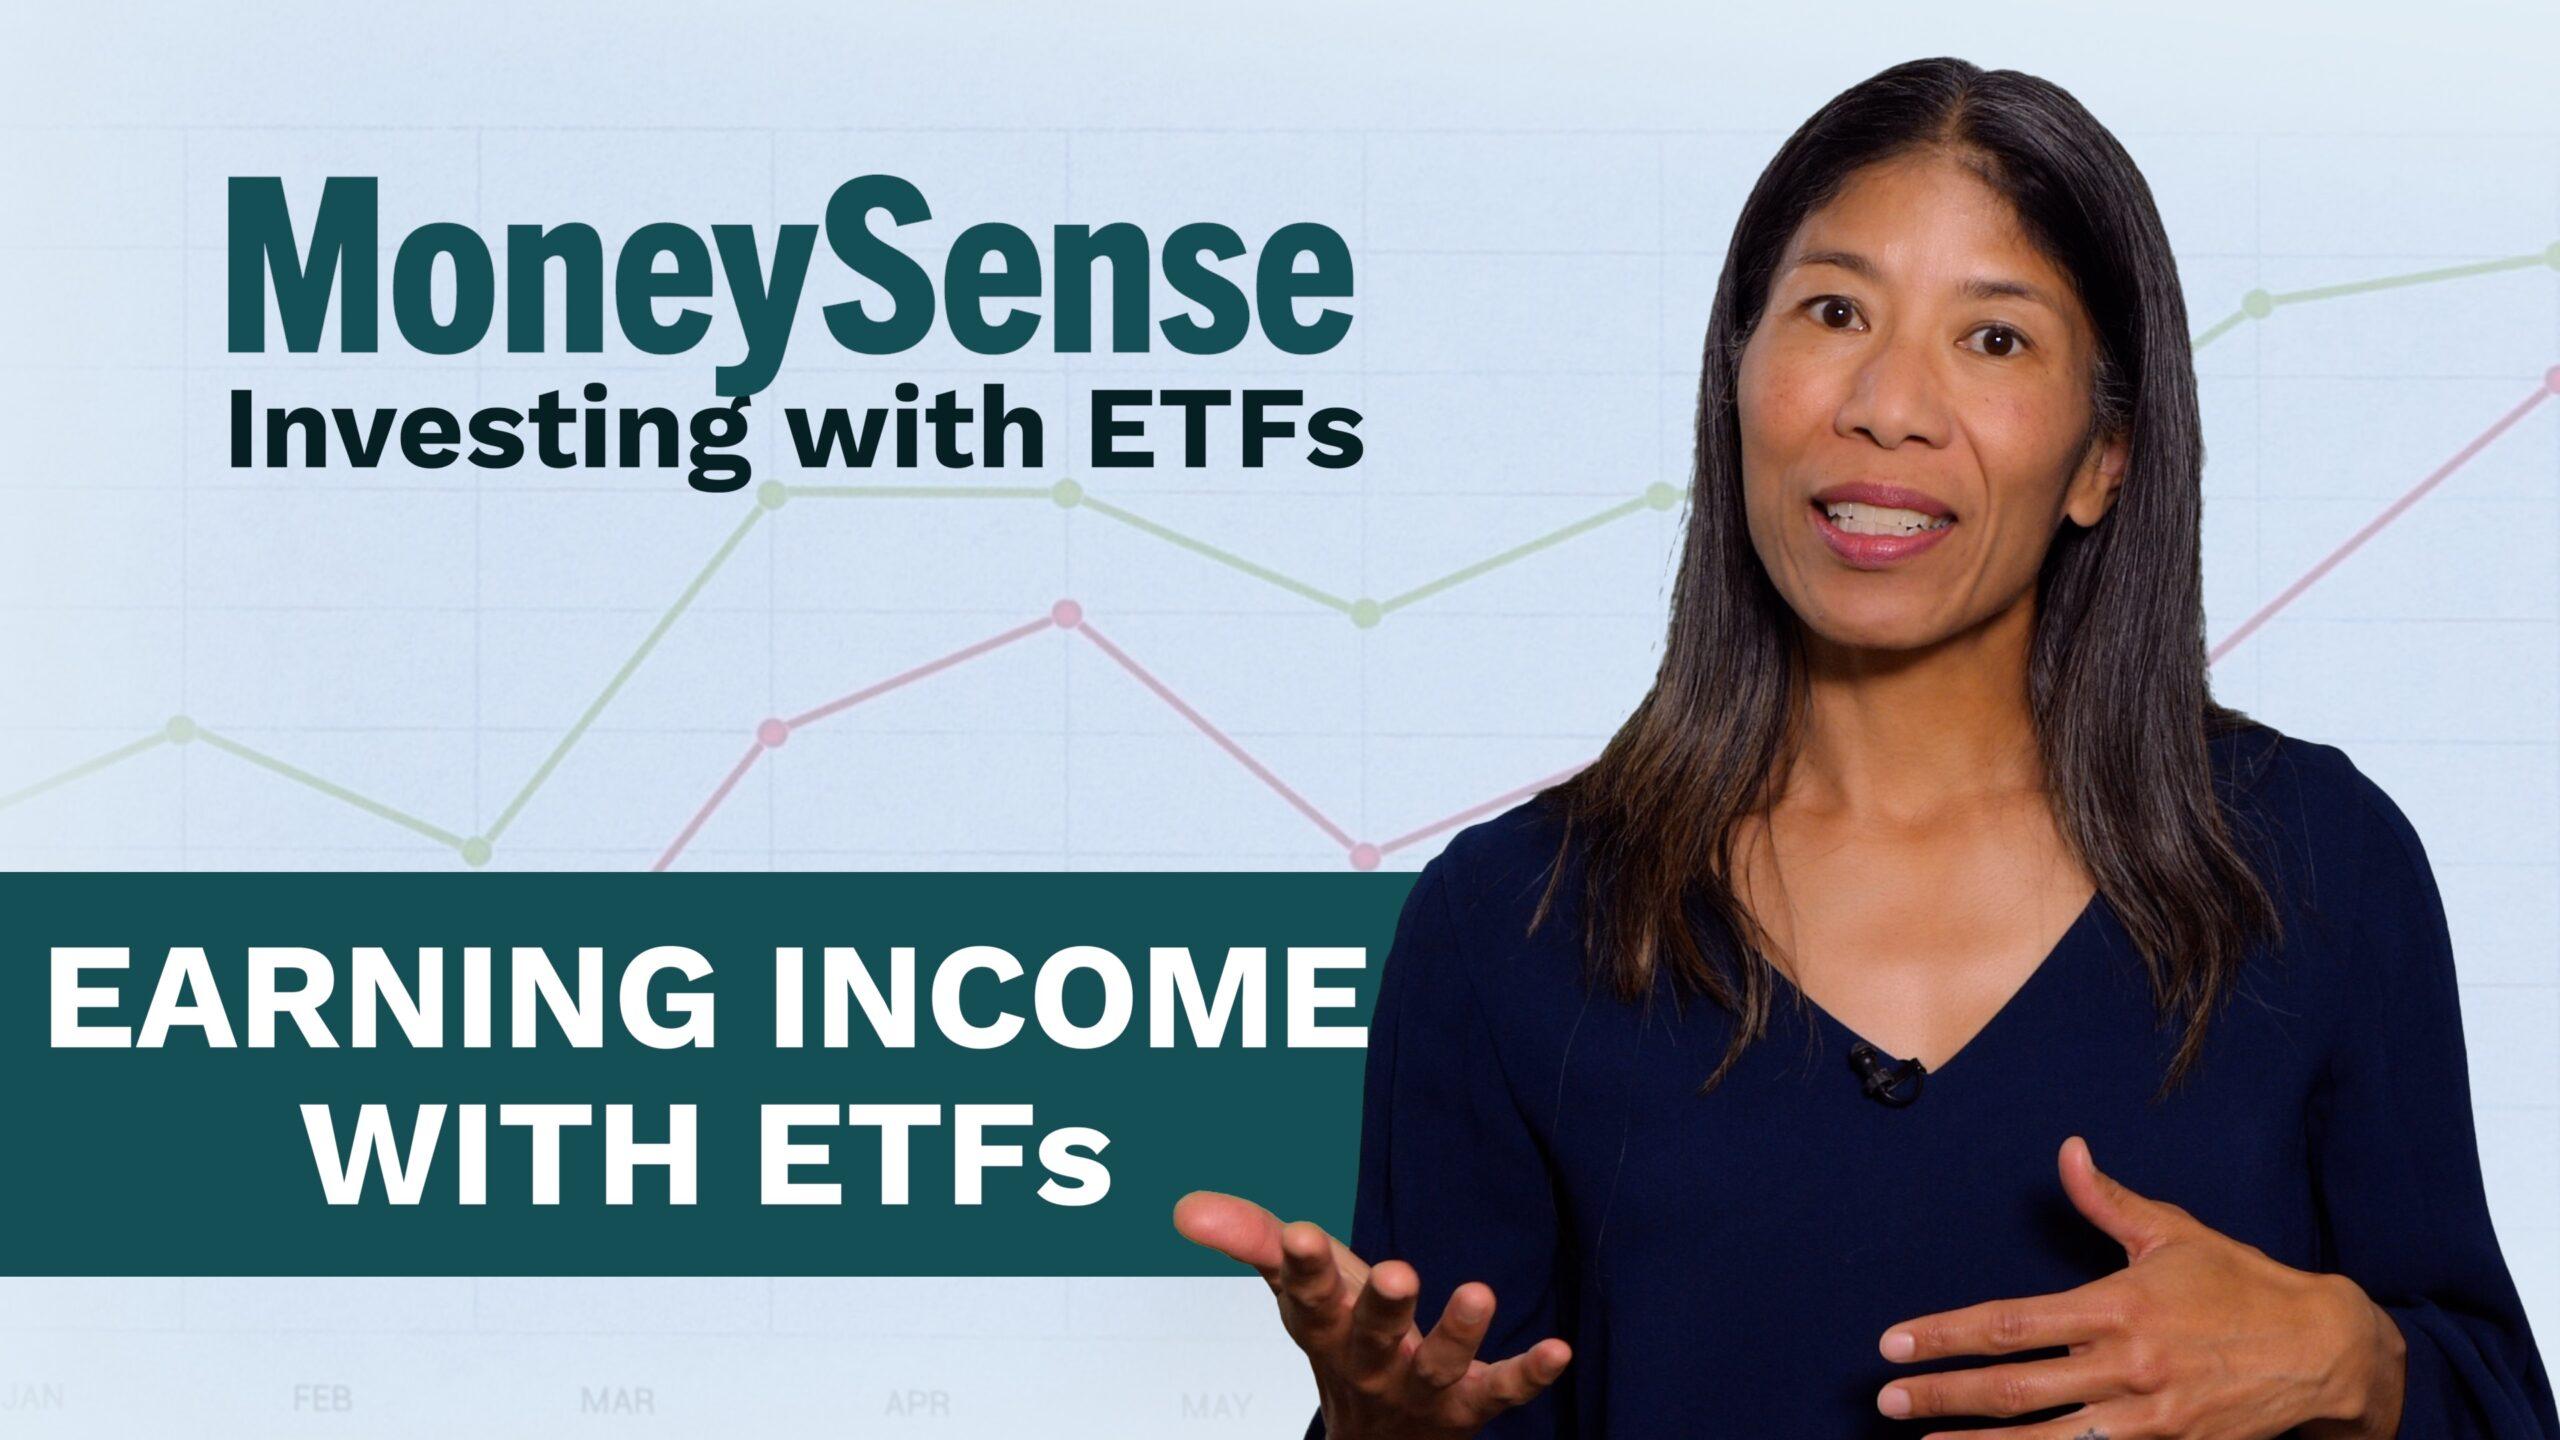 MoneySense editor explains earning income with ETFs